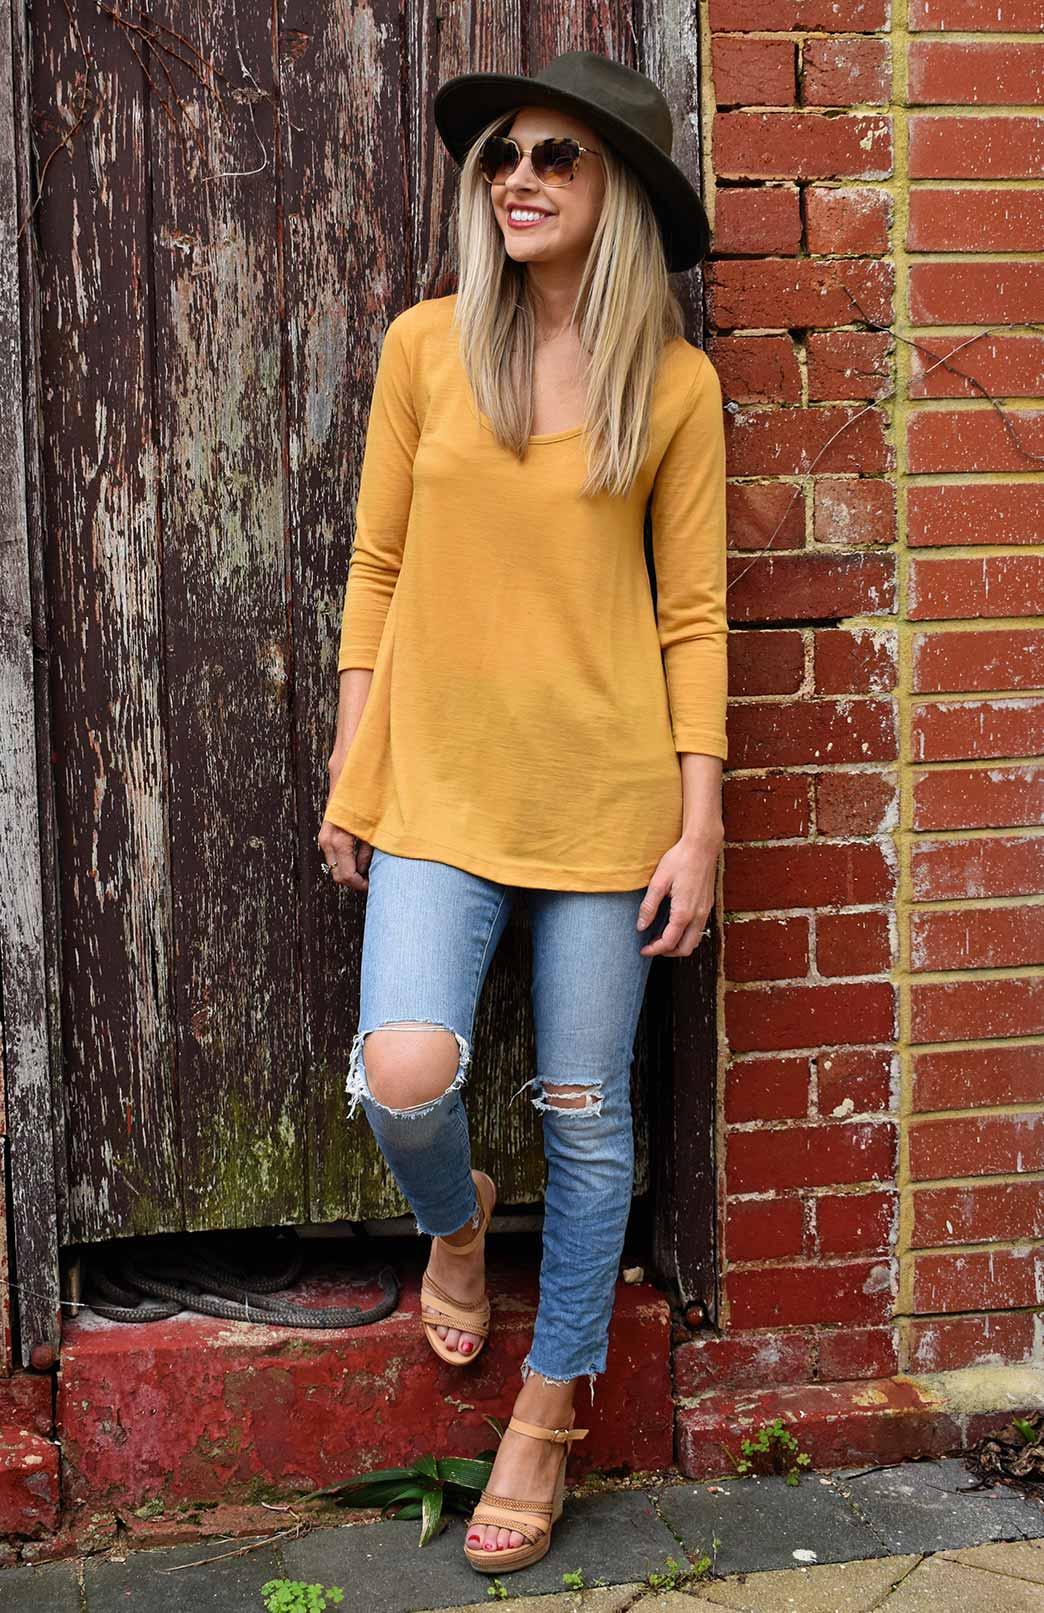 Rennie Top - Women's Merino Wool Mustard Yellow Sleeved Swing Top with Scooped Neckline - Smitten Merino Tasmania Australia